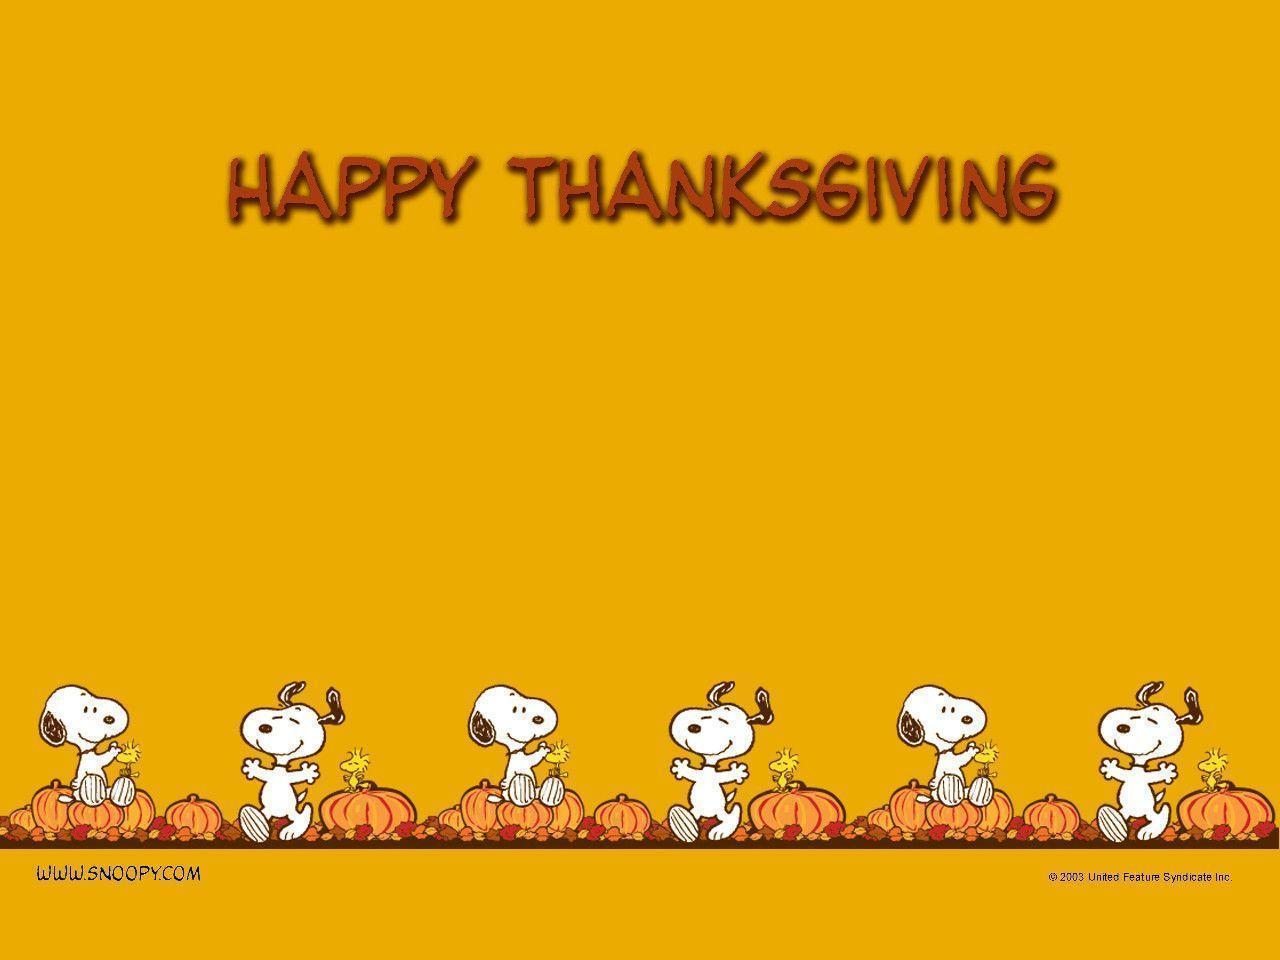 Thanksgiving - Peanuts Wallpaper (452773) - Fanpop